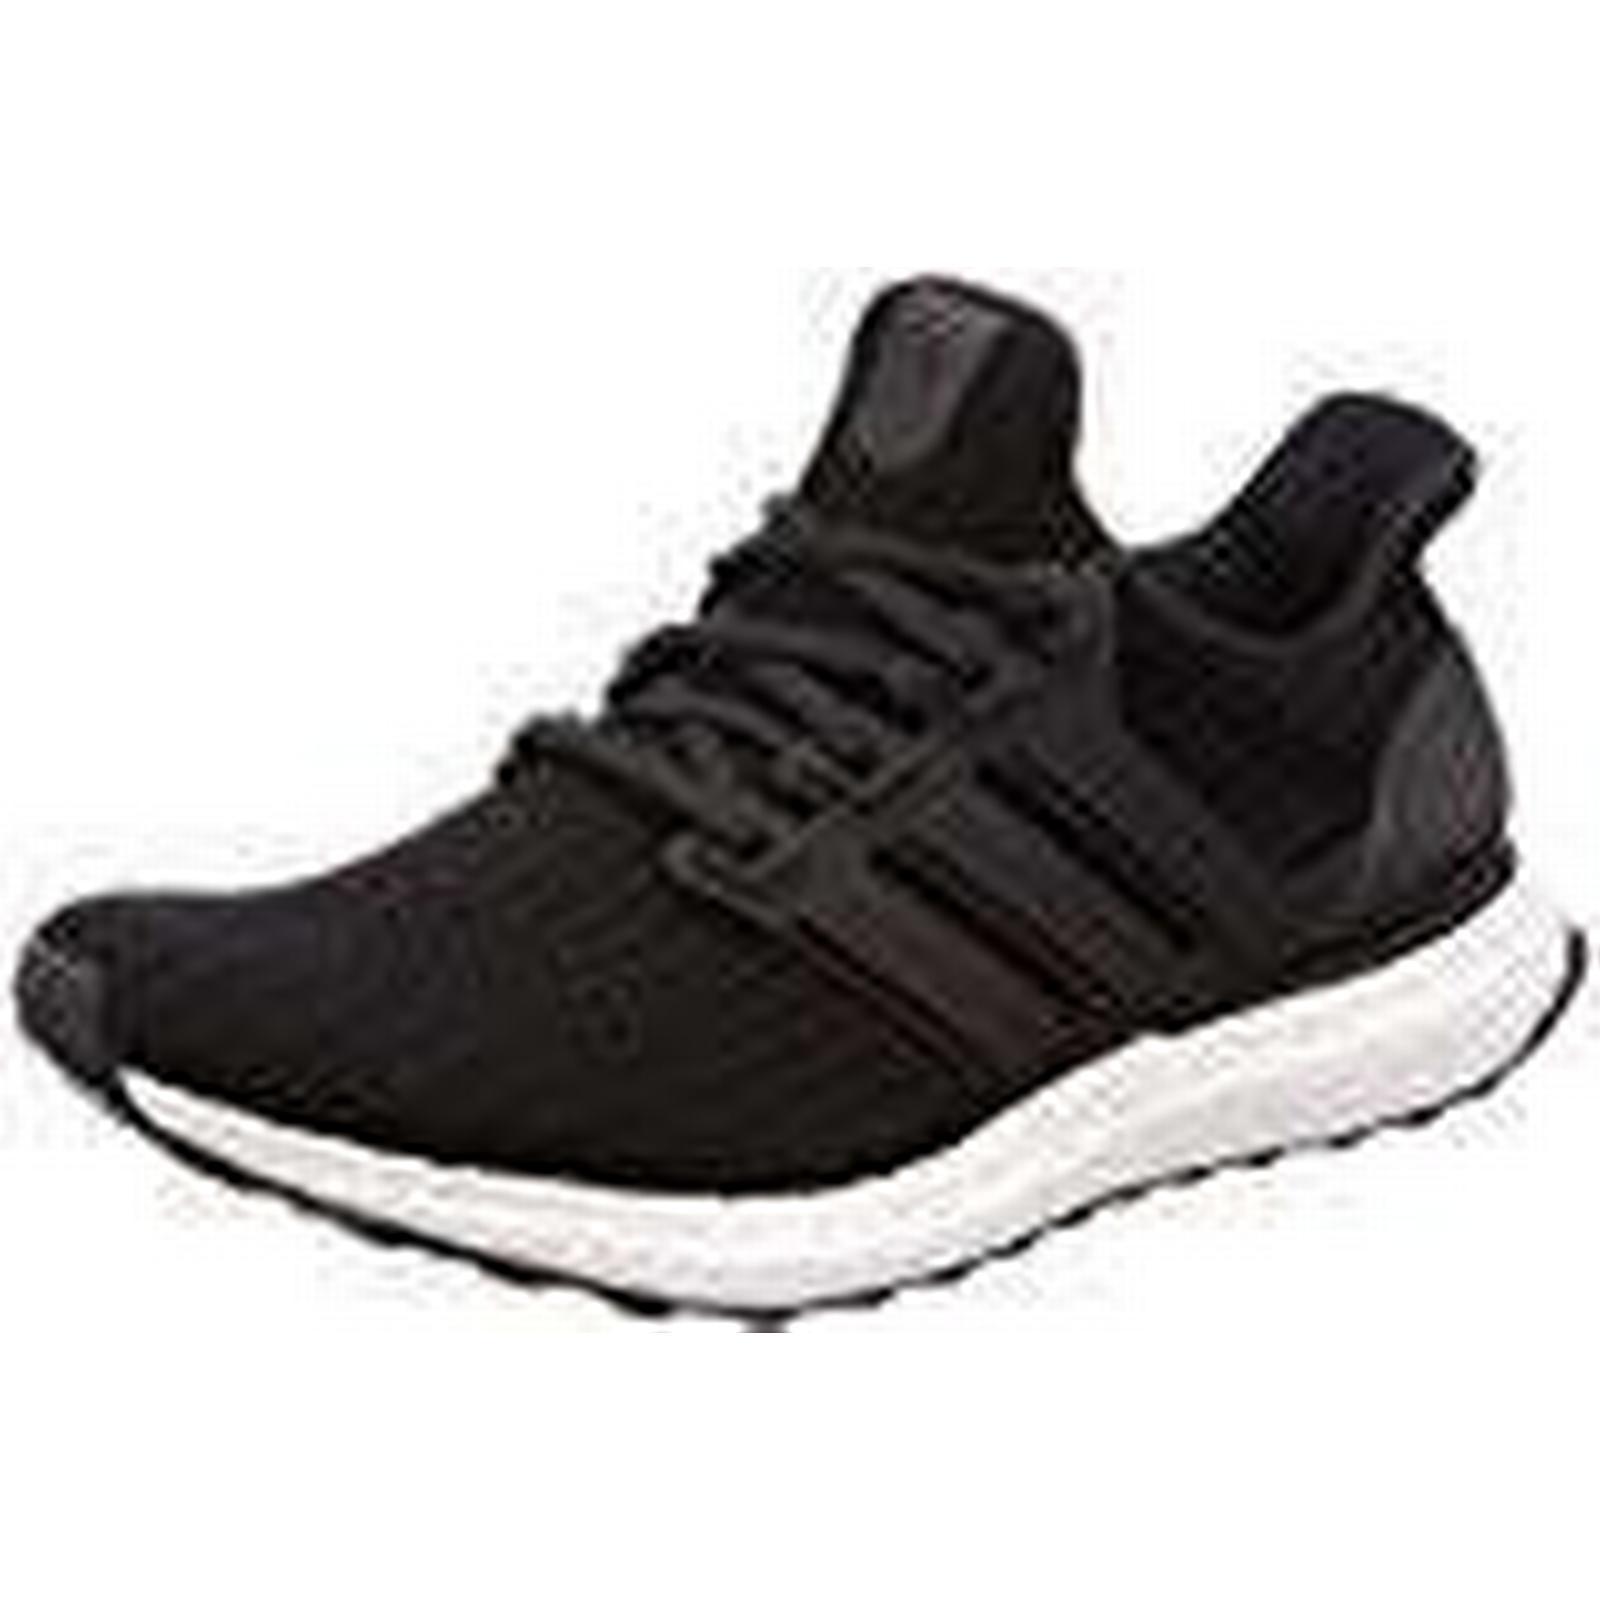 8e90604cc23 ... adidas mens ultraboost running 9.5 shoes core black 0 9.5 running uk 44  eu 44ef2d